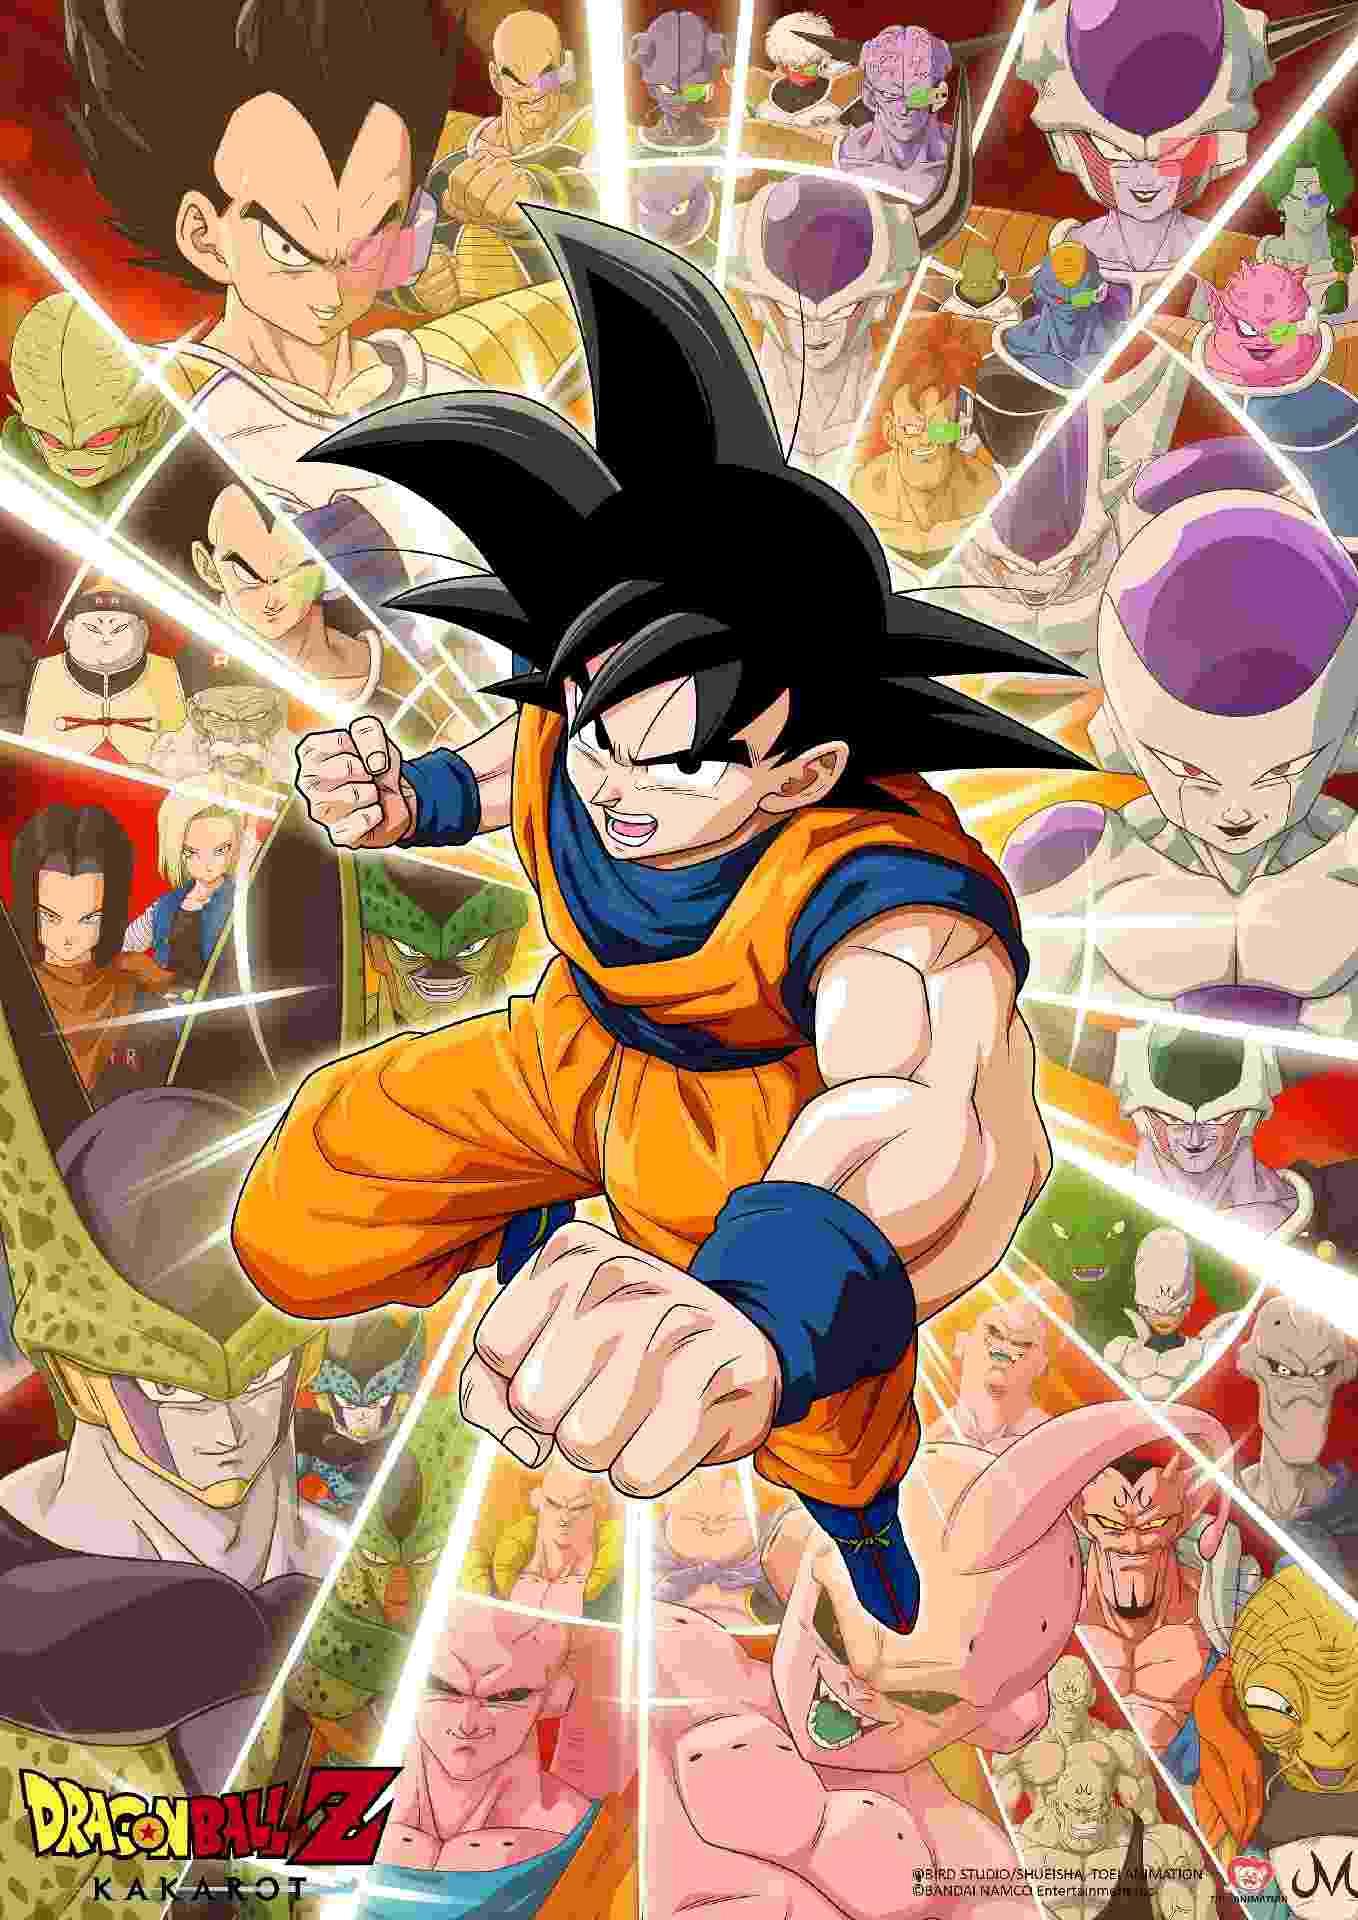 Dragon Ball Z Kakarot - Divulgação